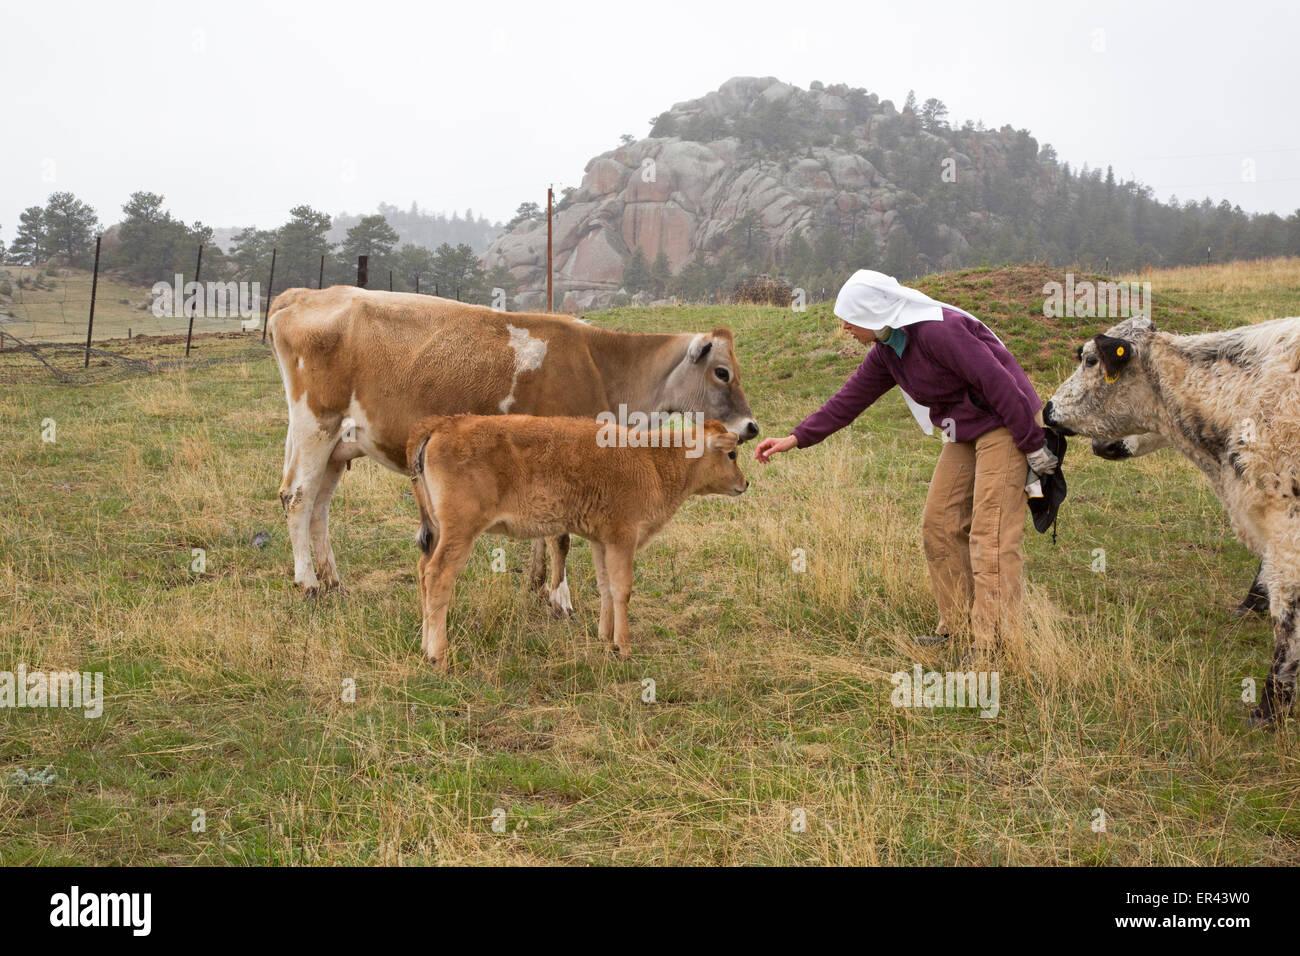 Virginia Dale, Colorado - The Abbey of St. Walburga, where Dominican nuns pray and run a cattle ranch. Stock Photo